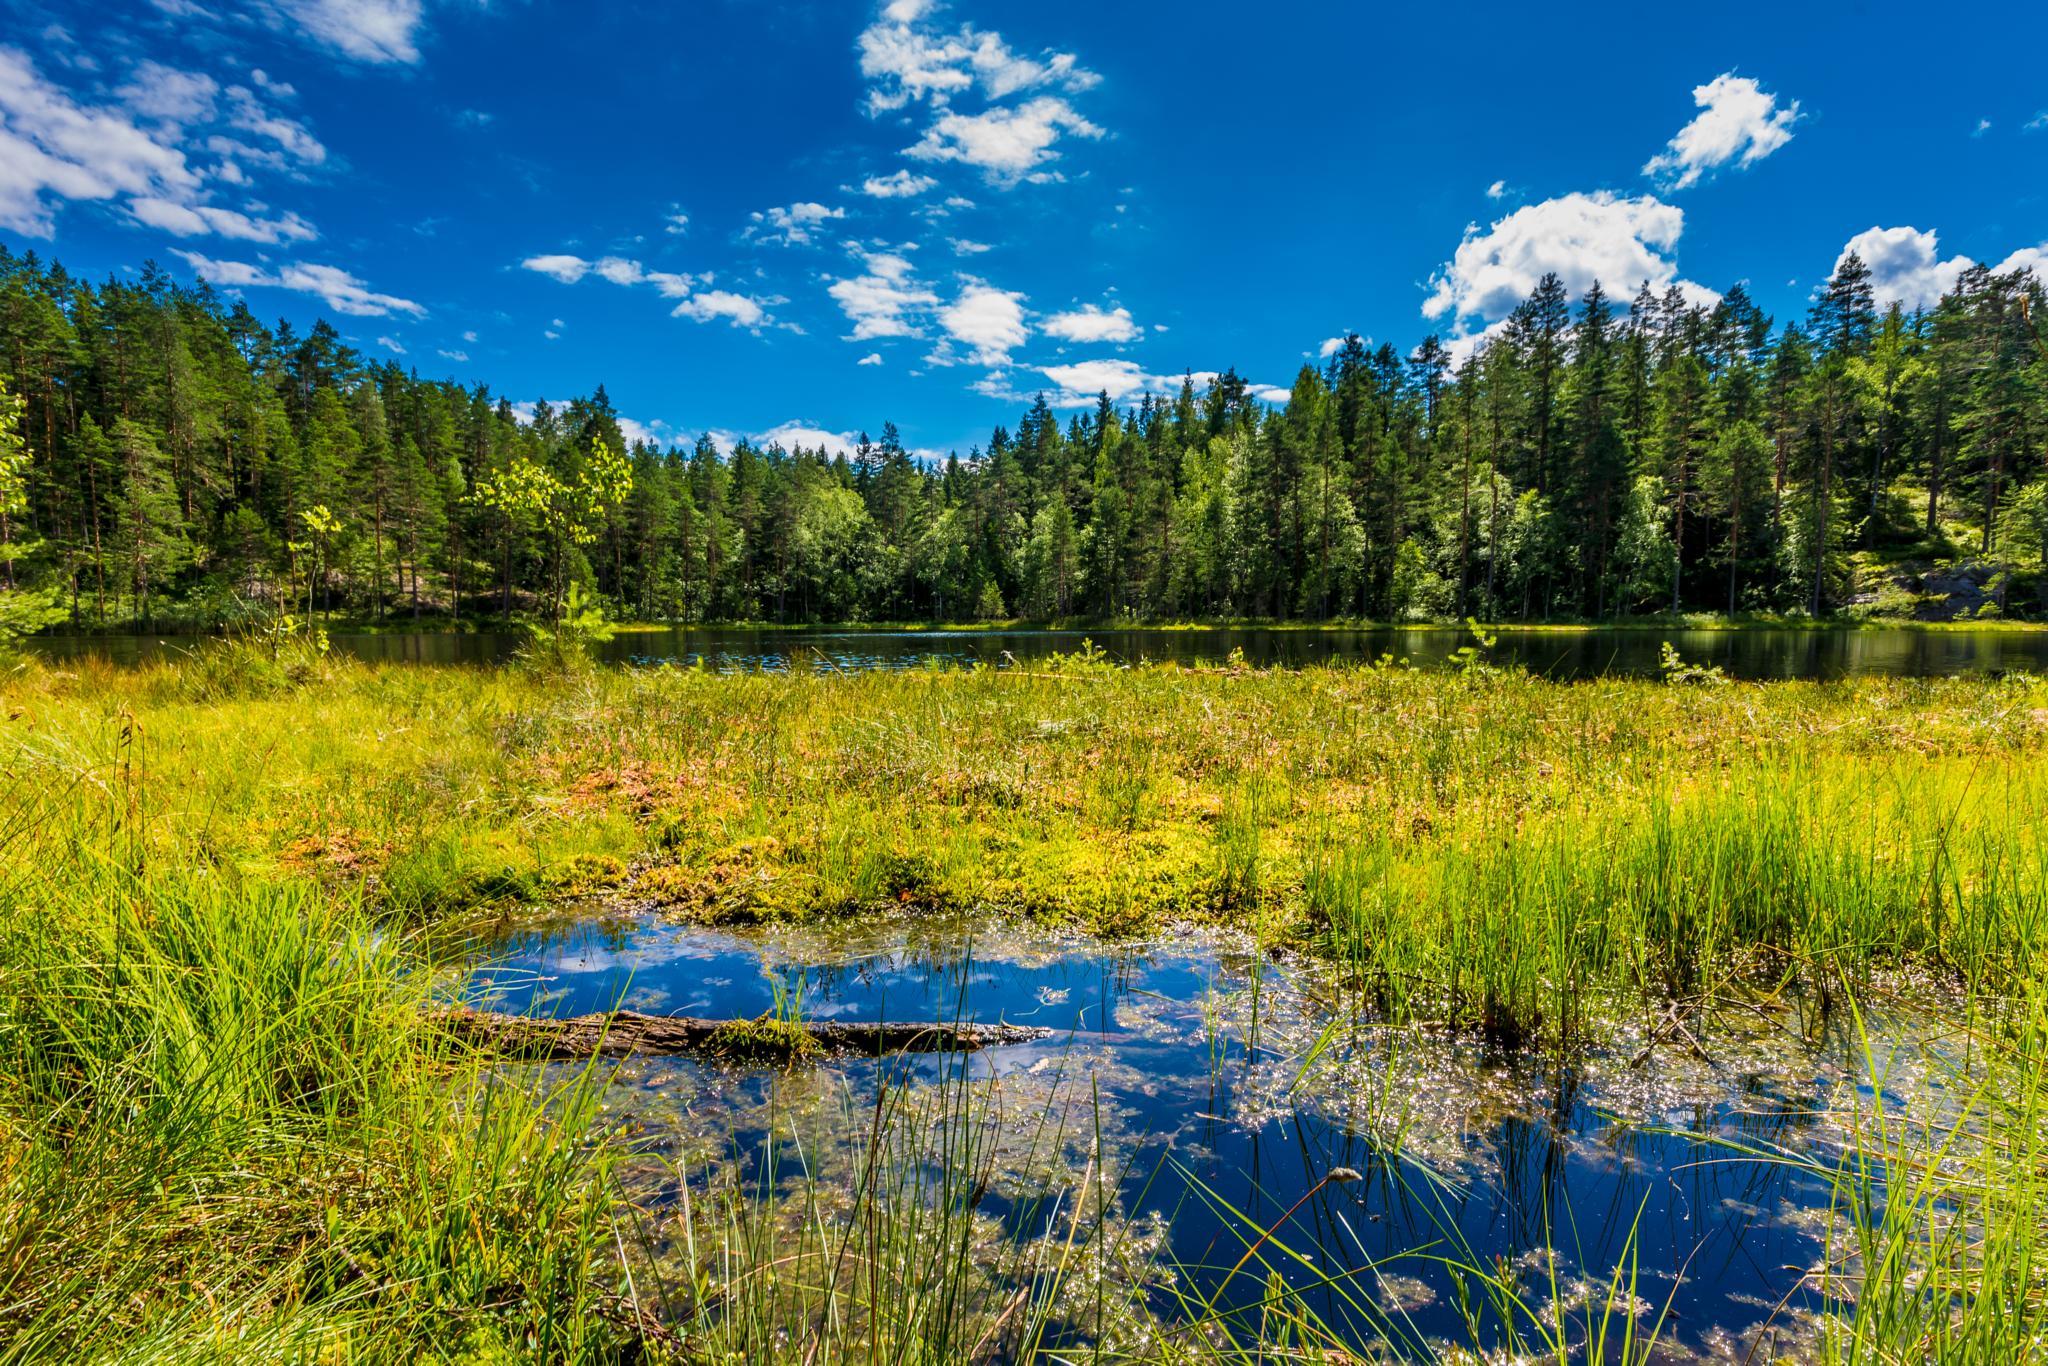 Swamp lake, Finland by Matti